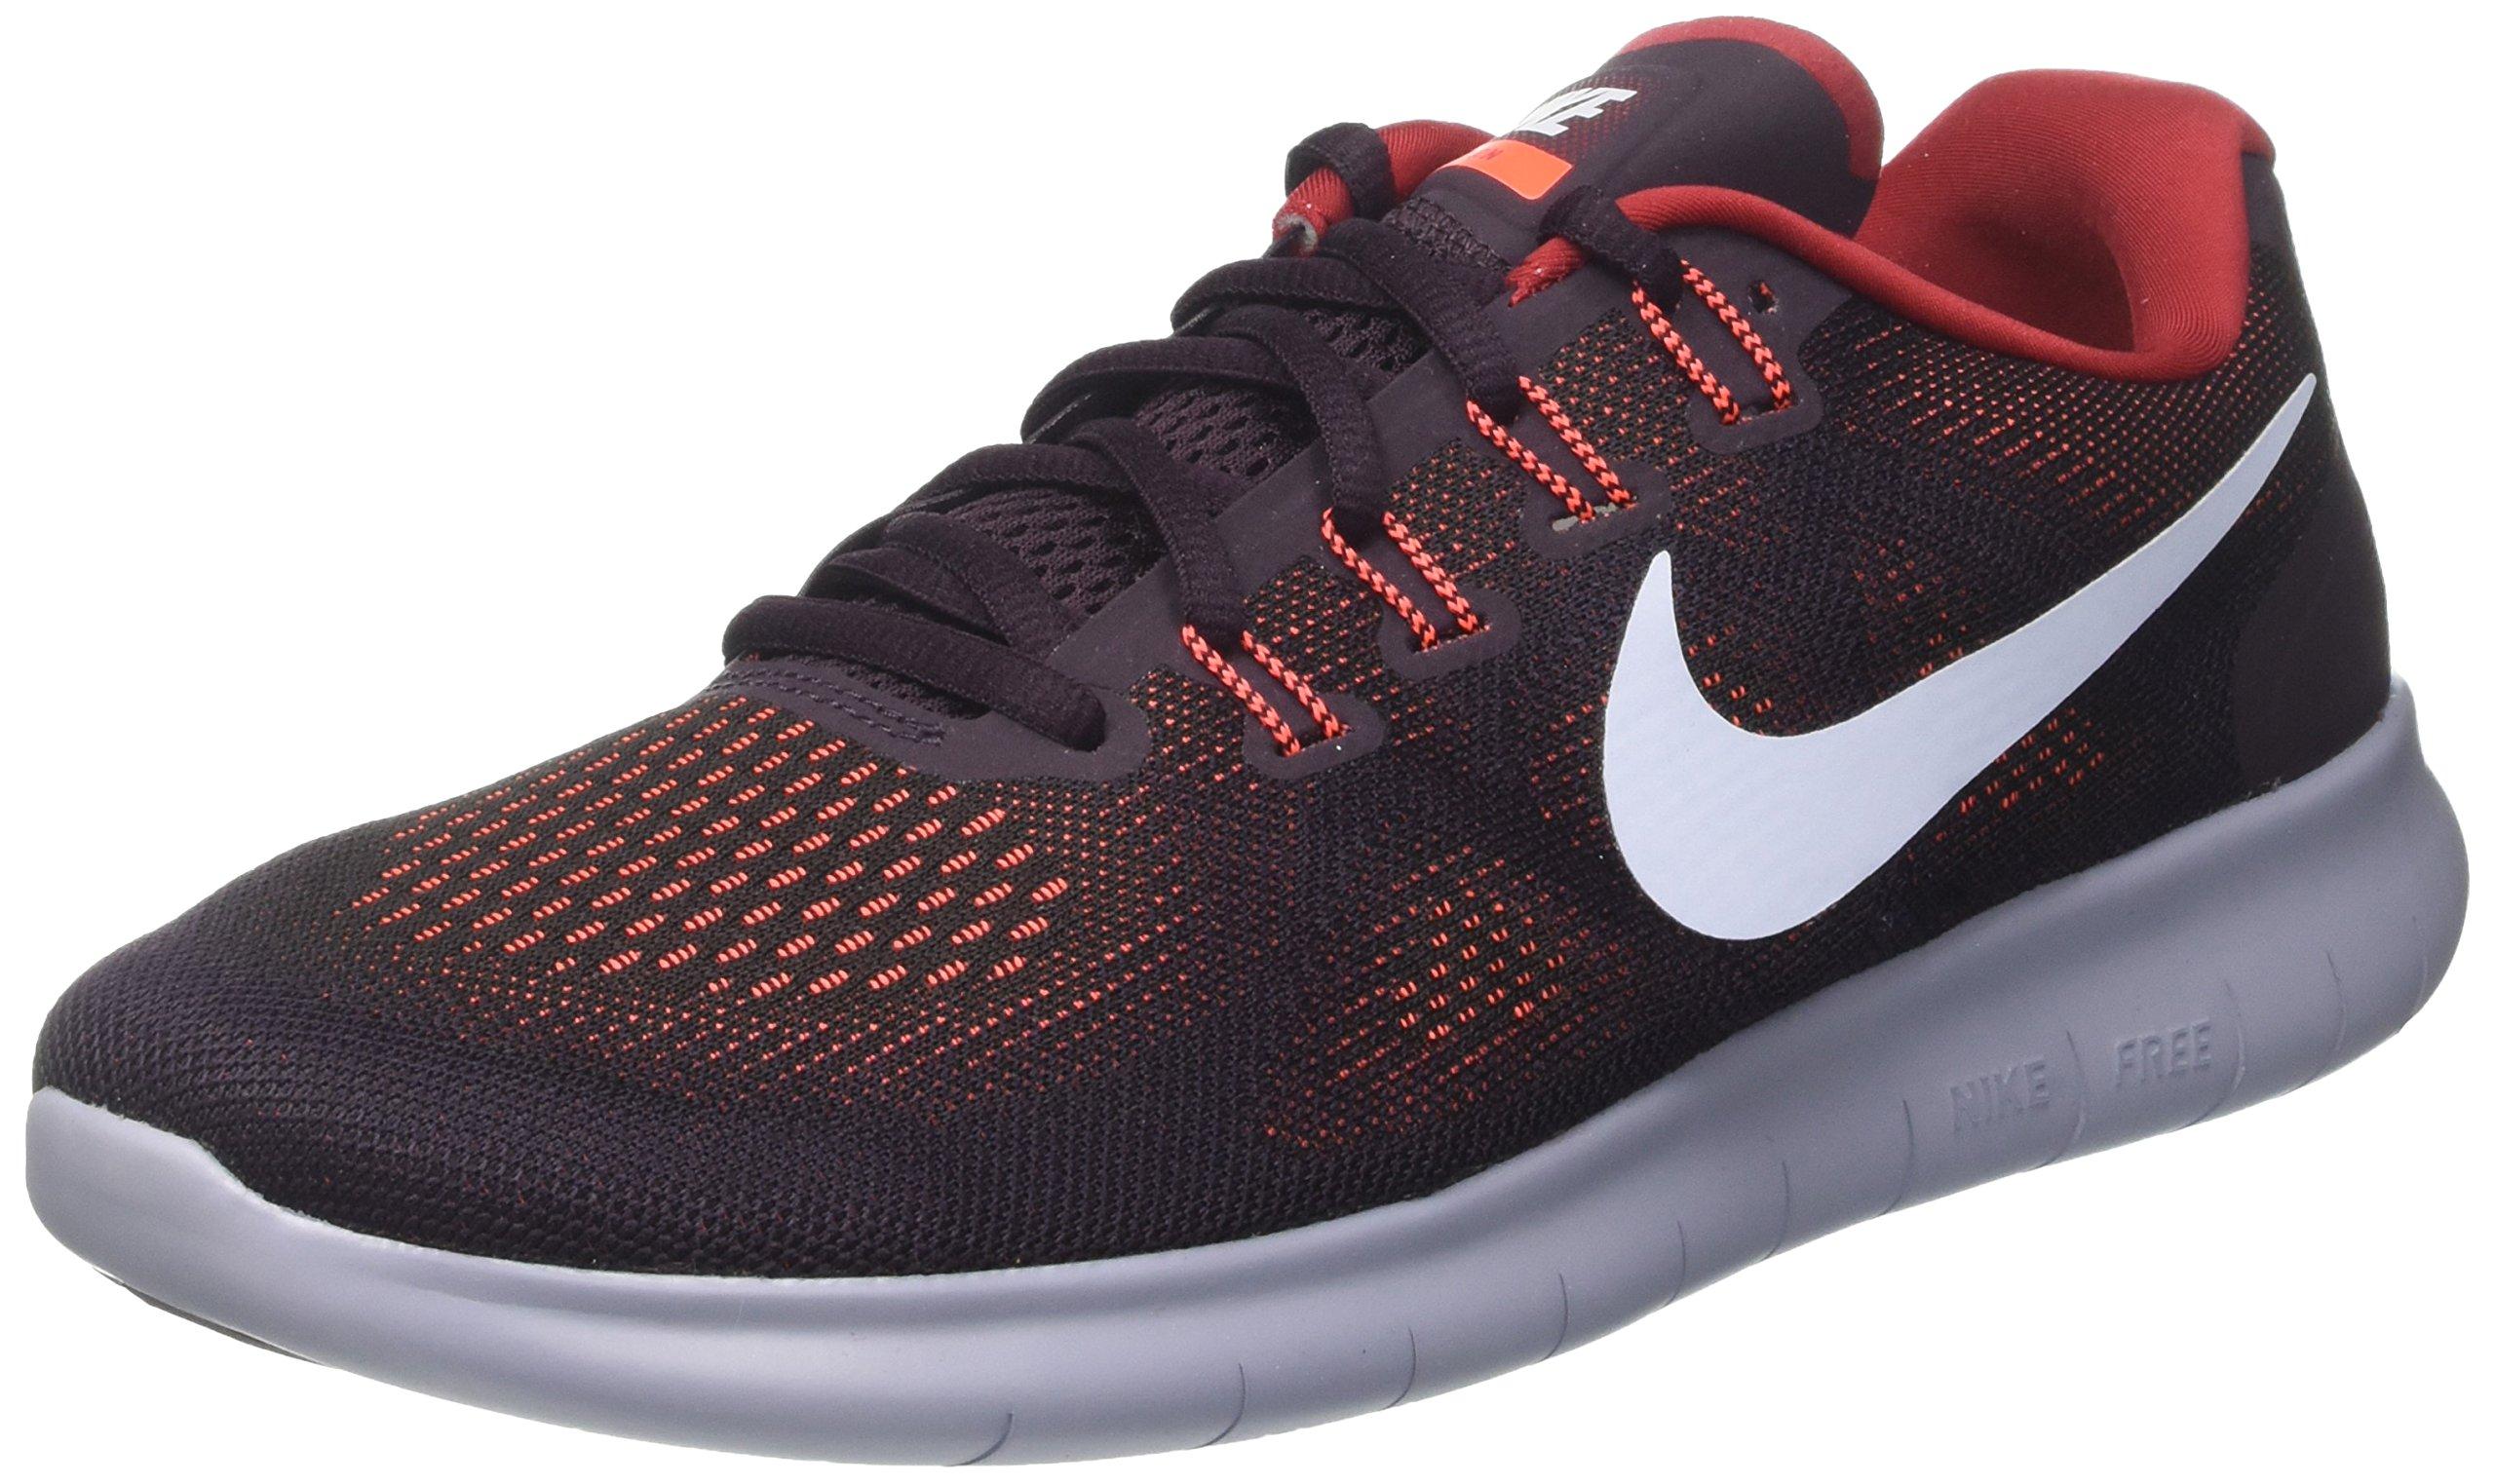 Nike Mens Free RN 2017 Running Shoe Black/Hydrogen Blue-Tough Red 9 D(M) US